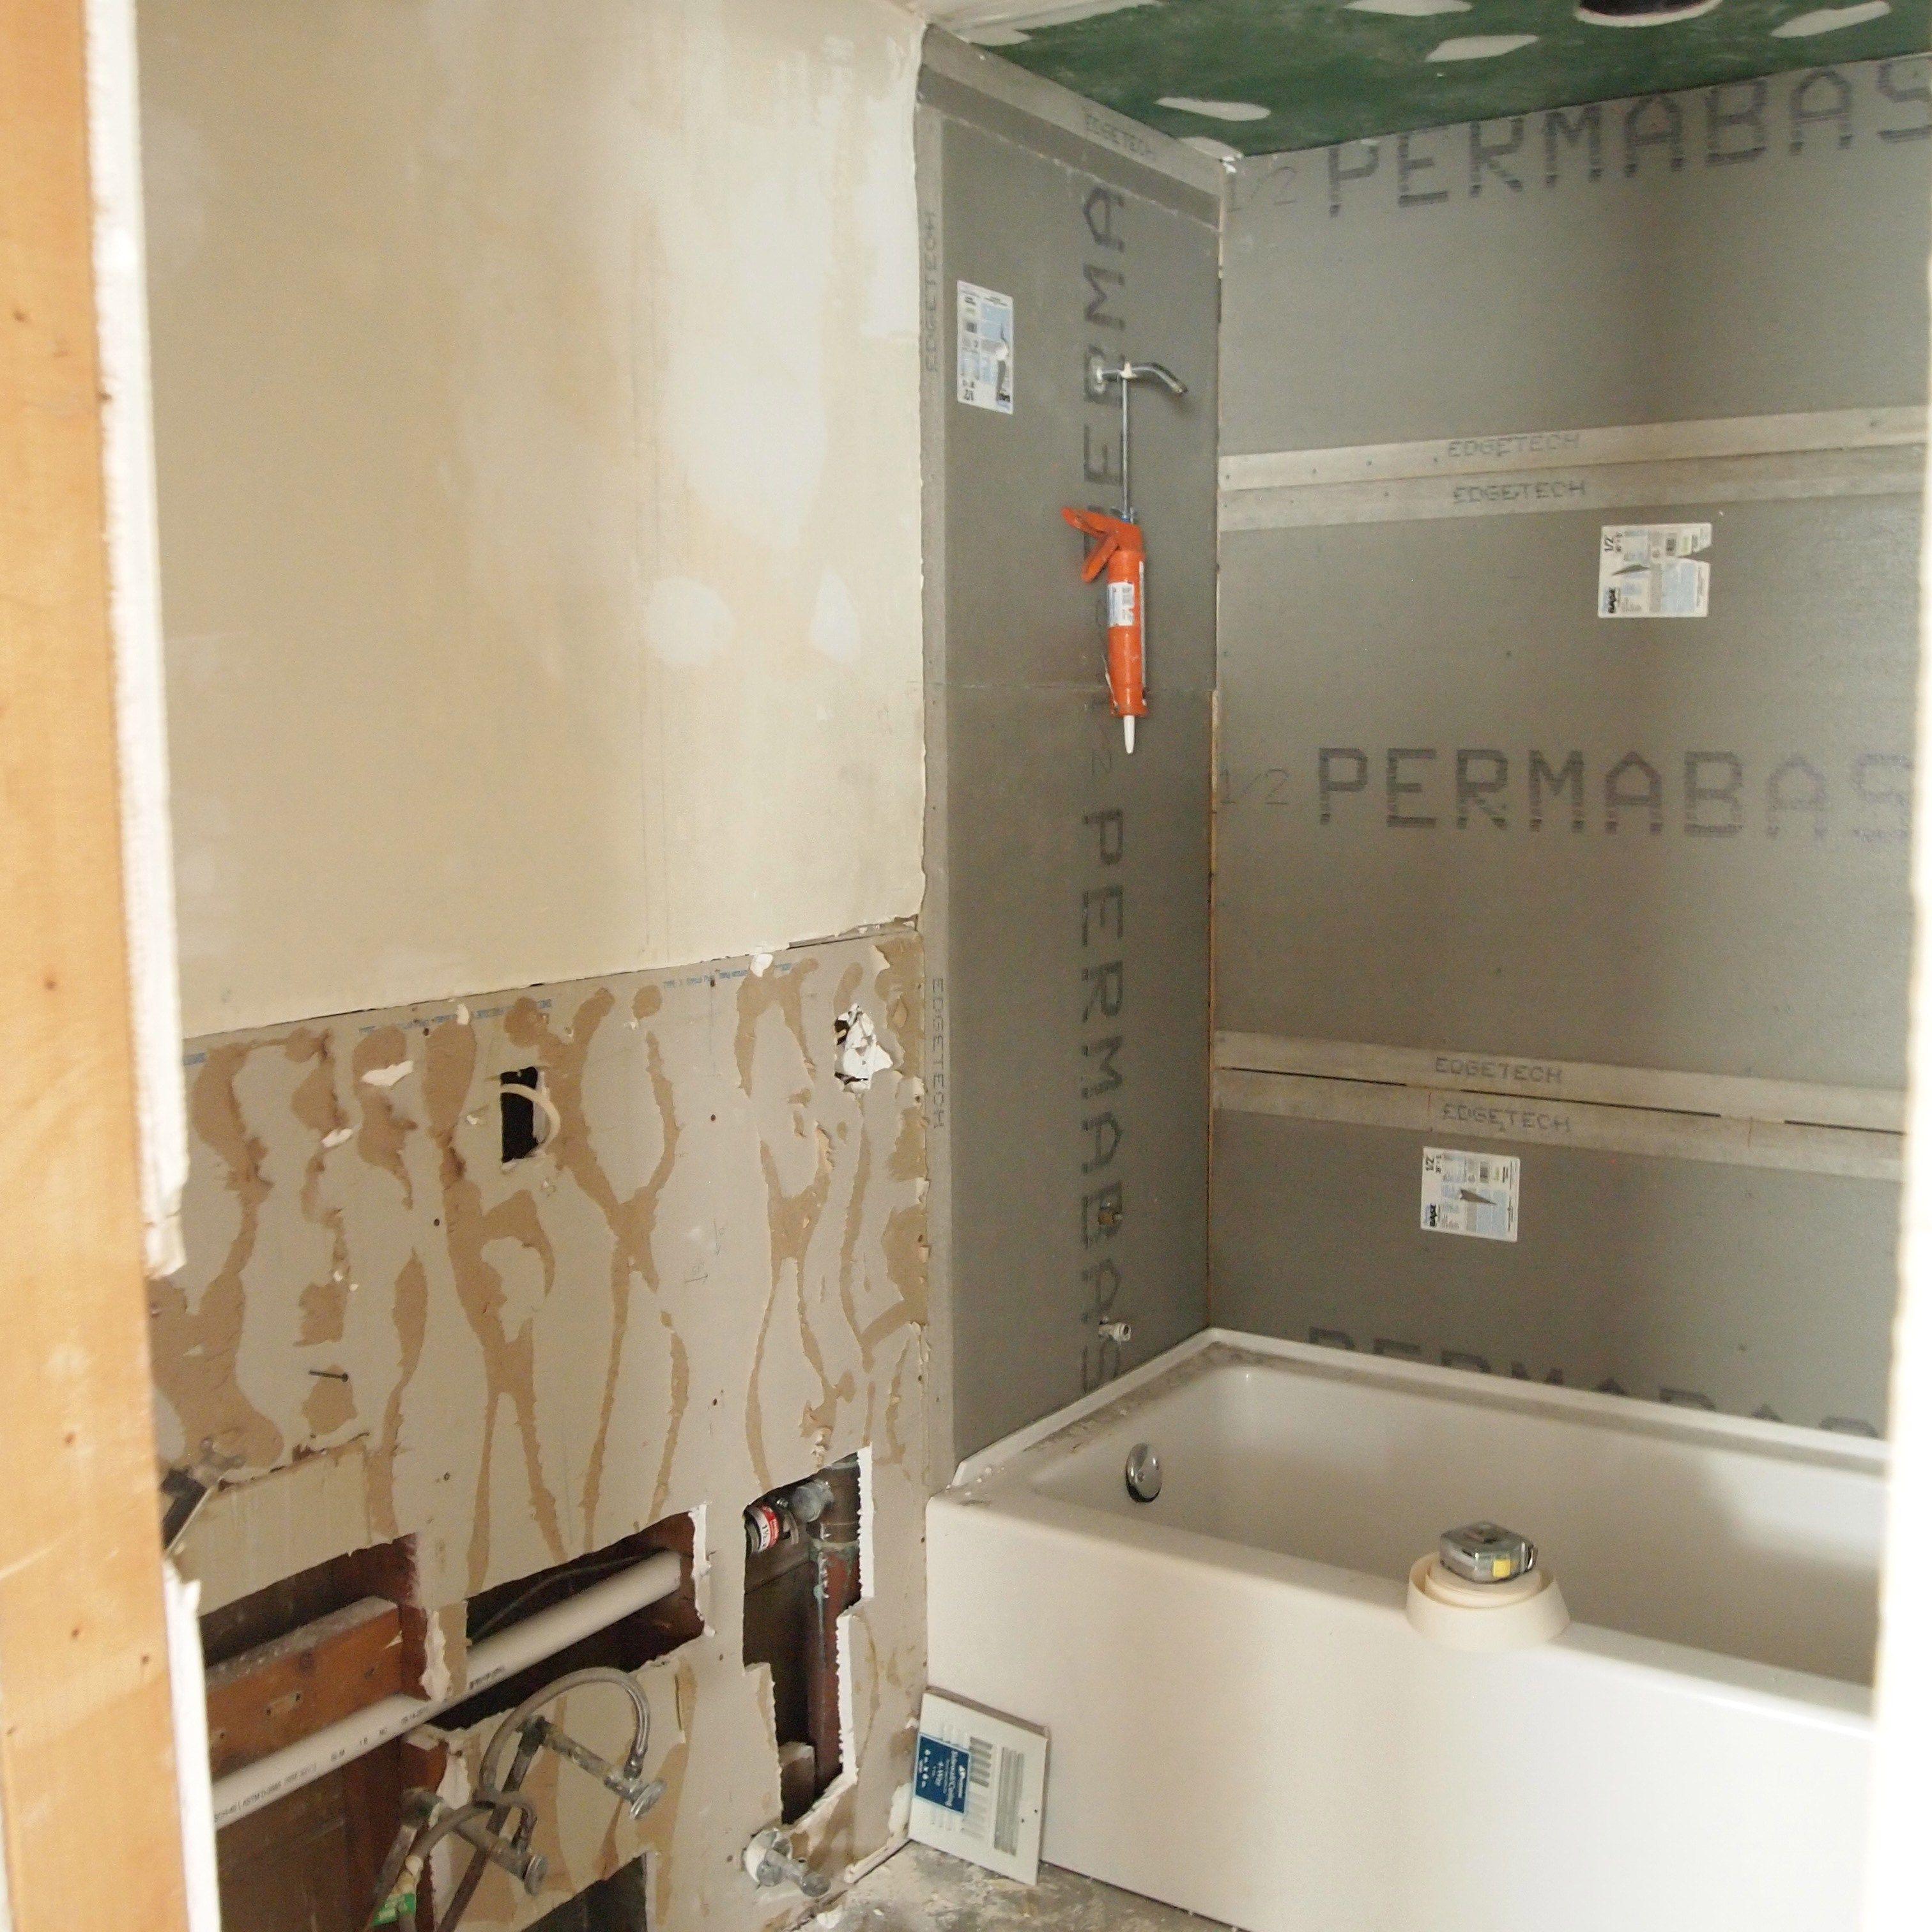 drywall for bathroom. Drywall For The Bathroom